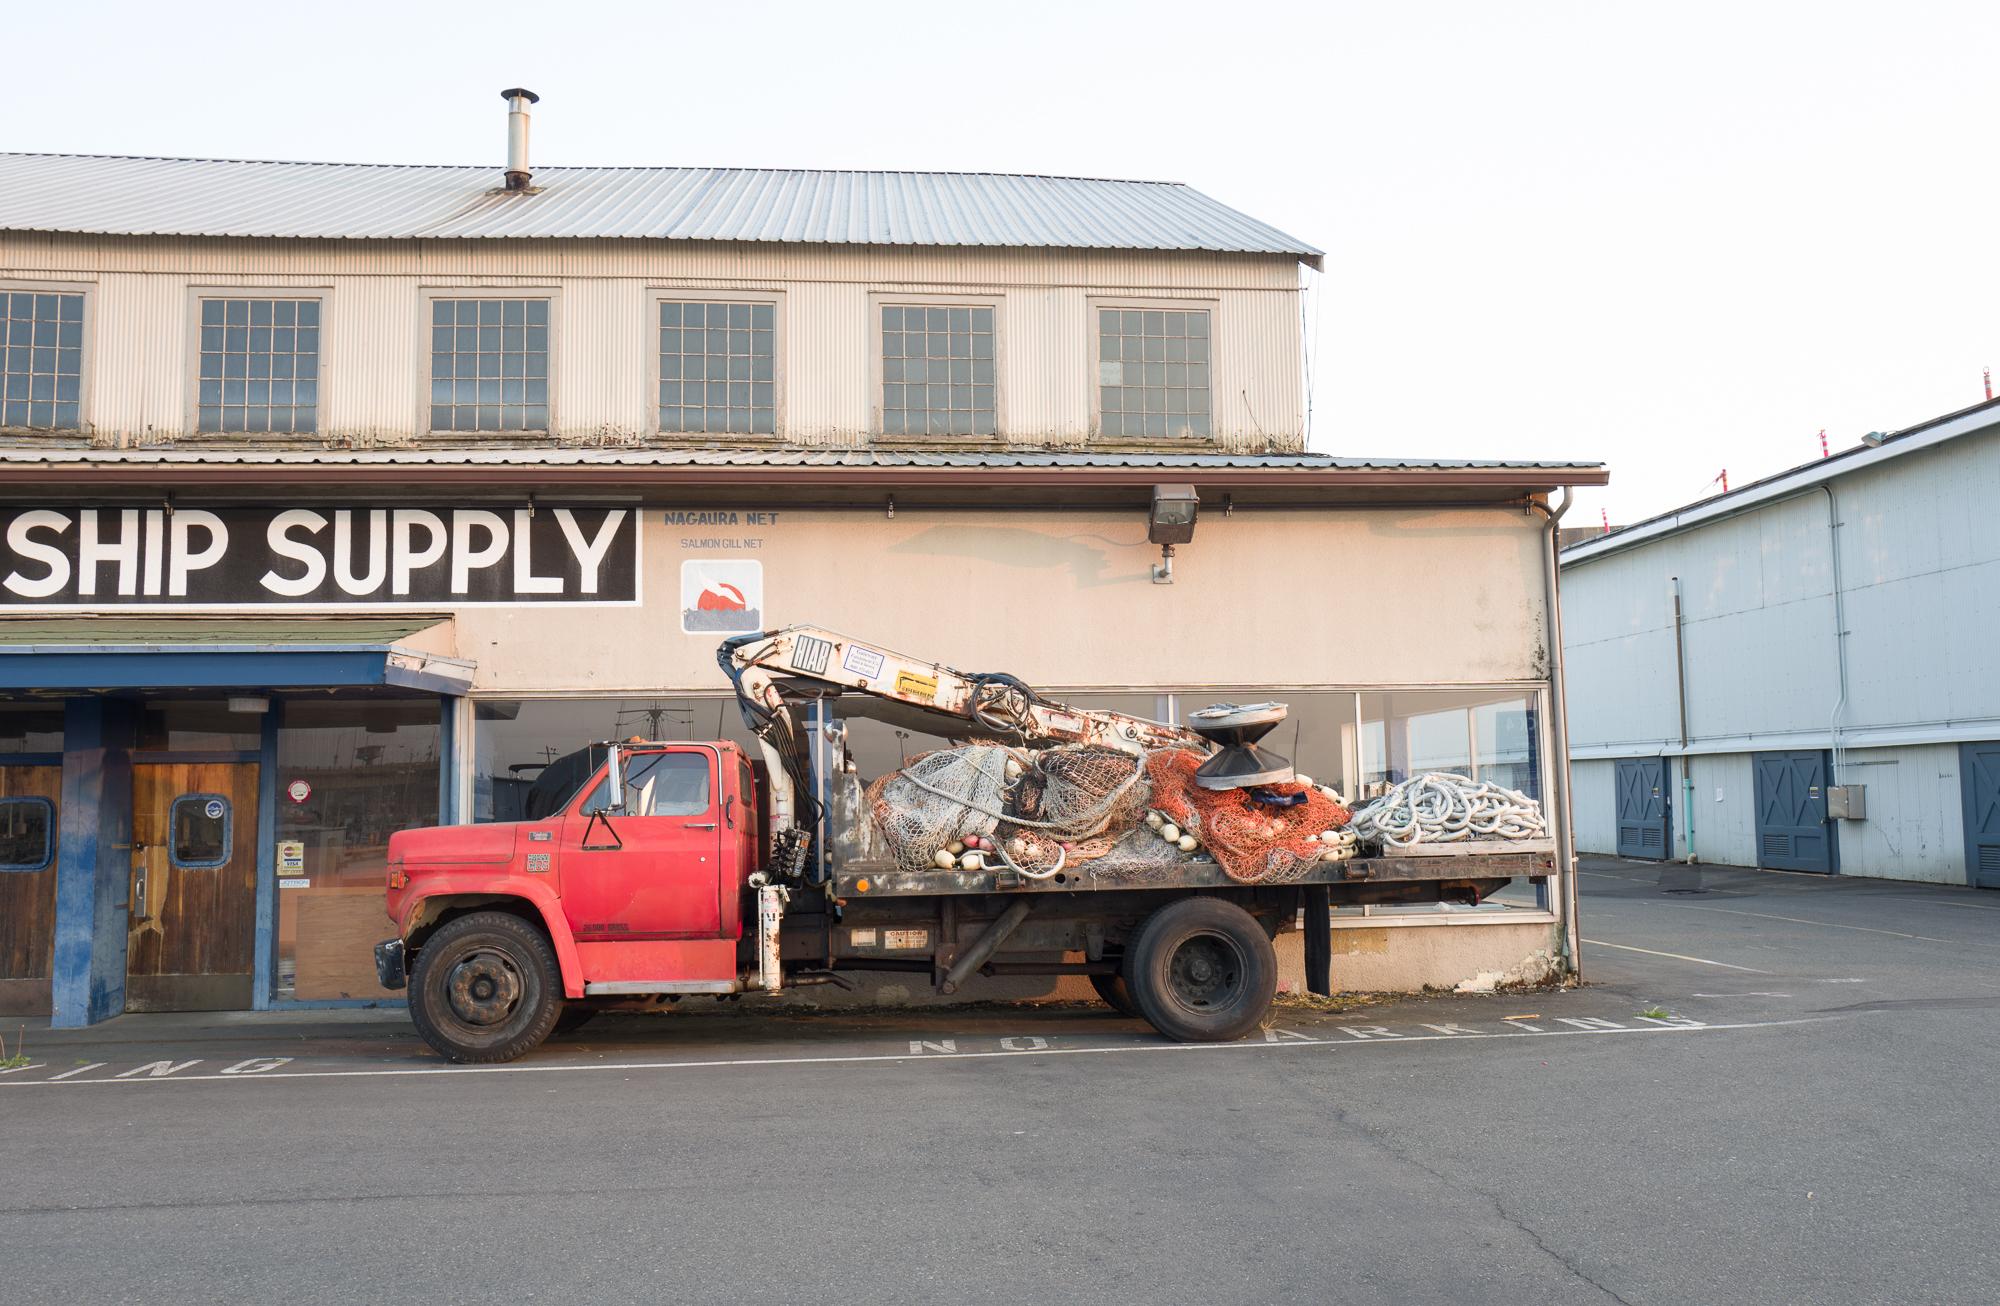 red truck, Magnolia